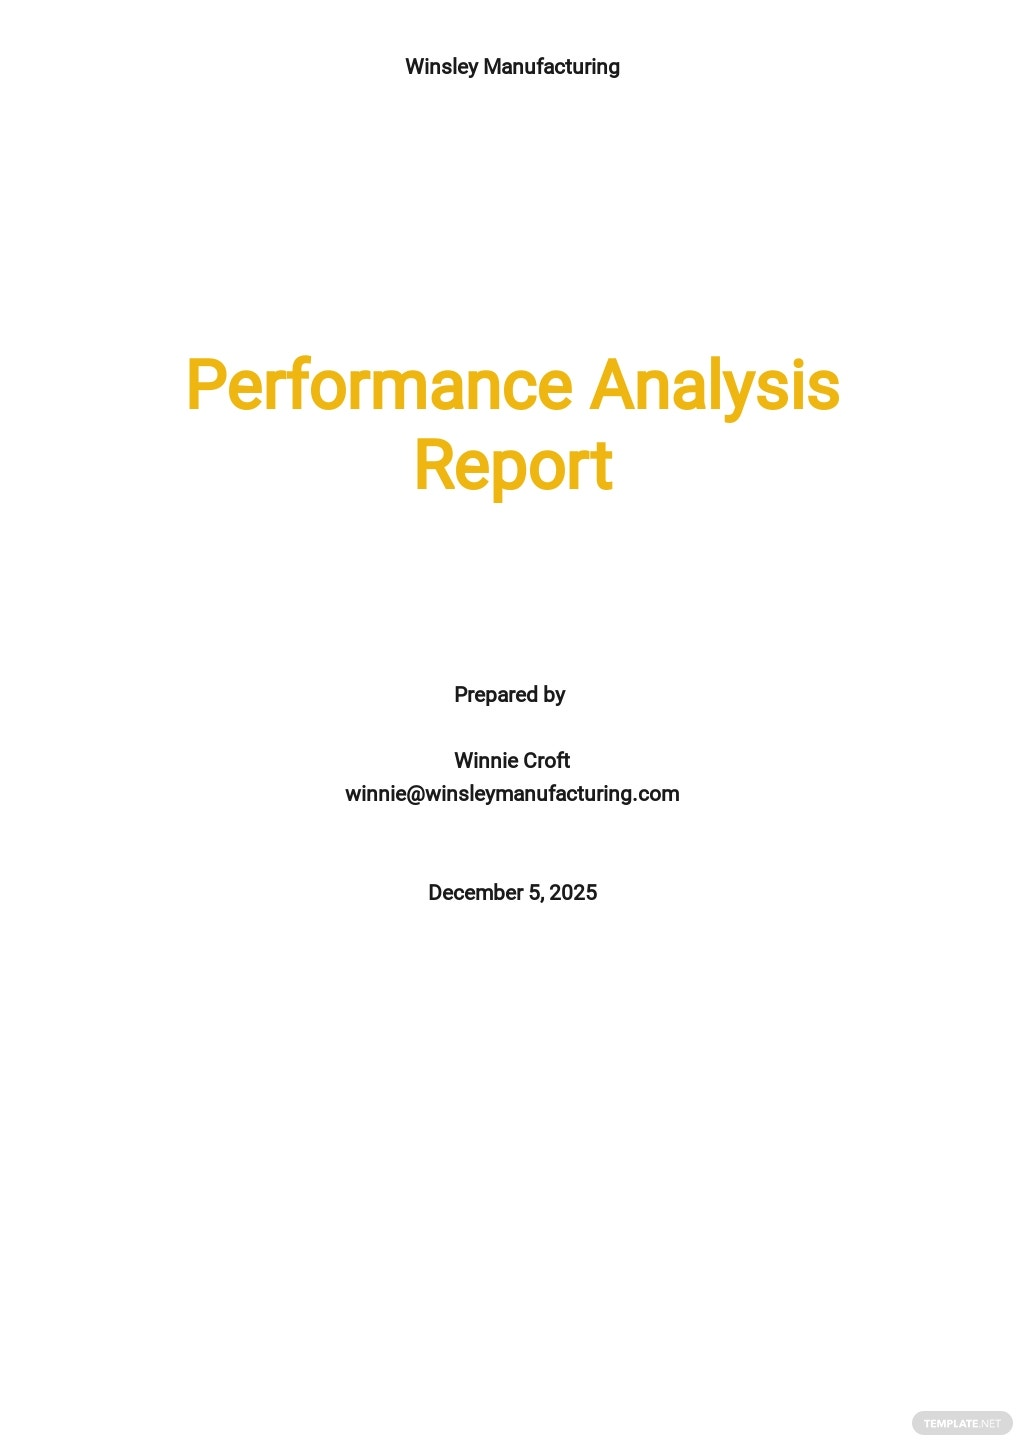 Performance Analysis Report Template.jpe